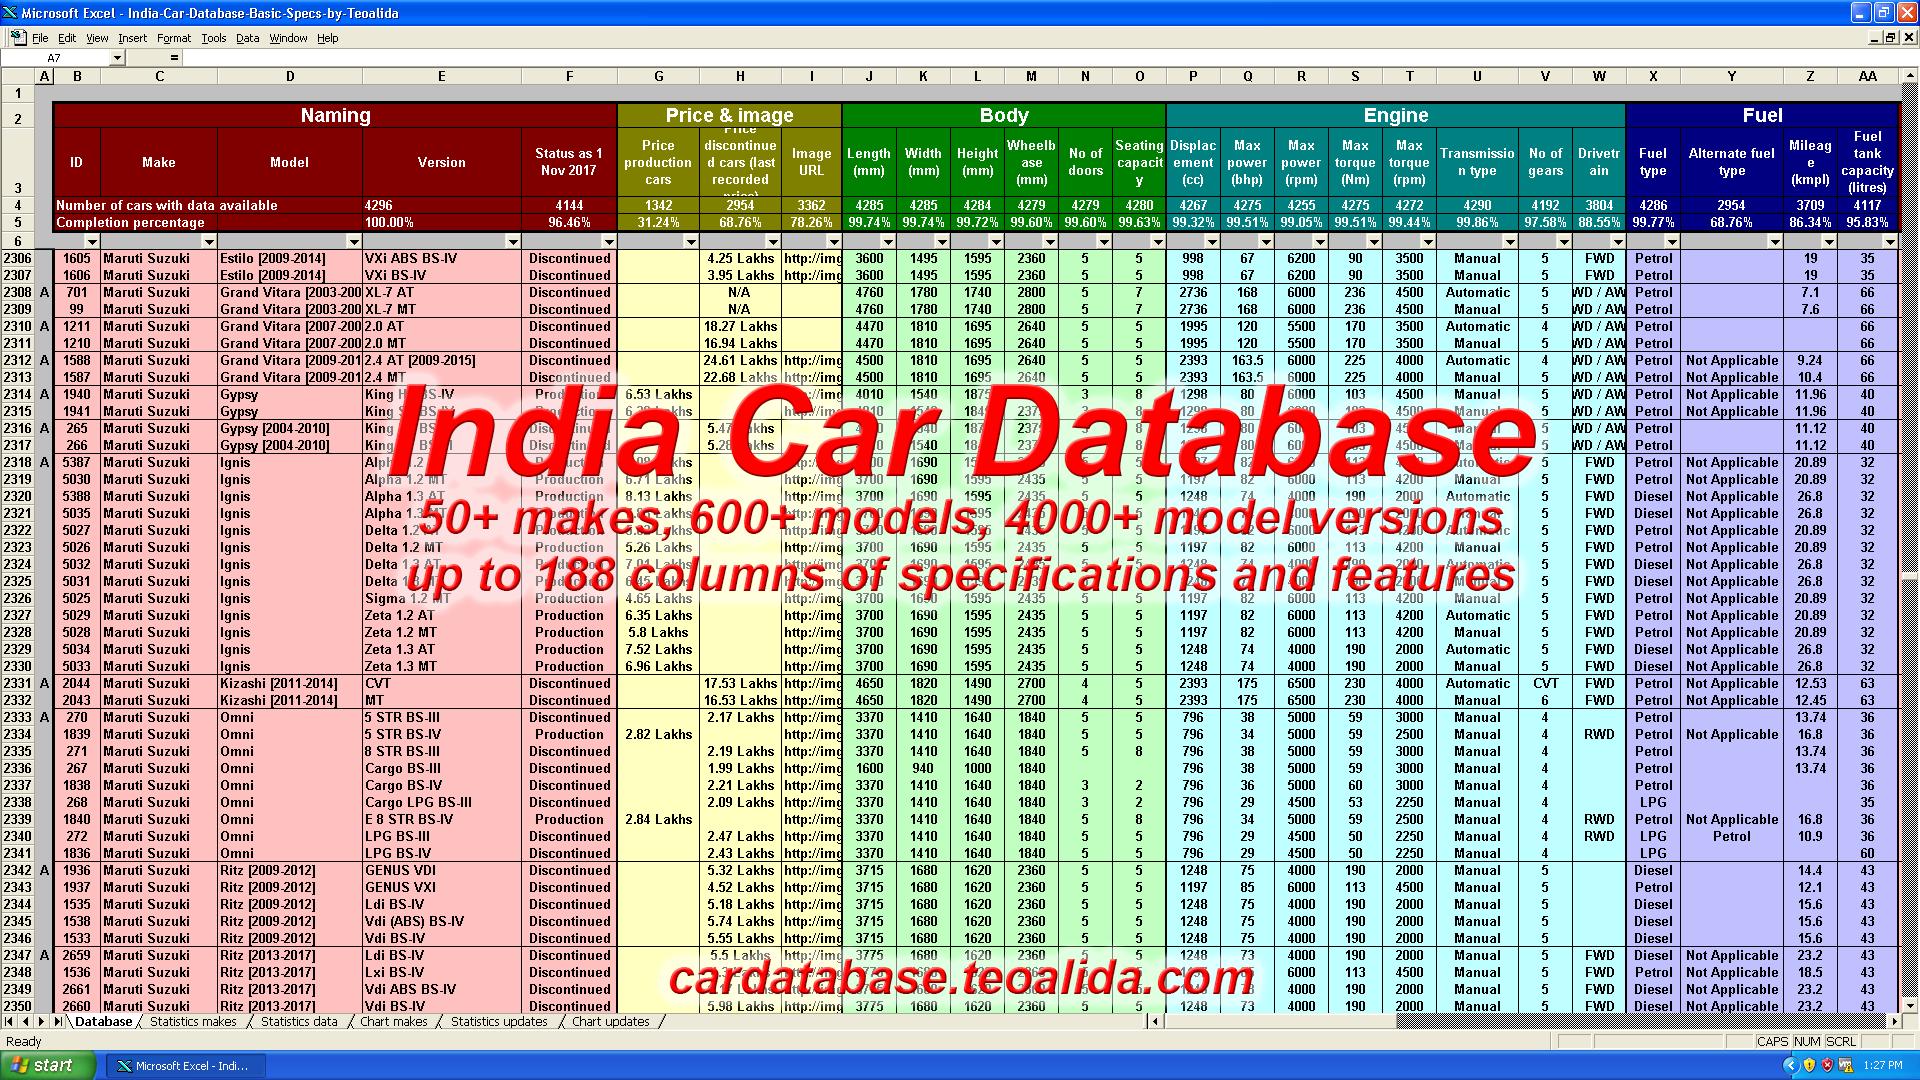 Oil Change Excel Spreadsheet Inside Car Database  Make, Model, Trim, Full Specifications In Excel Format